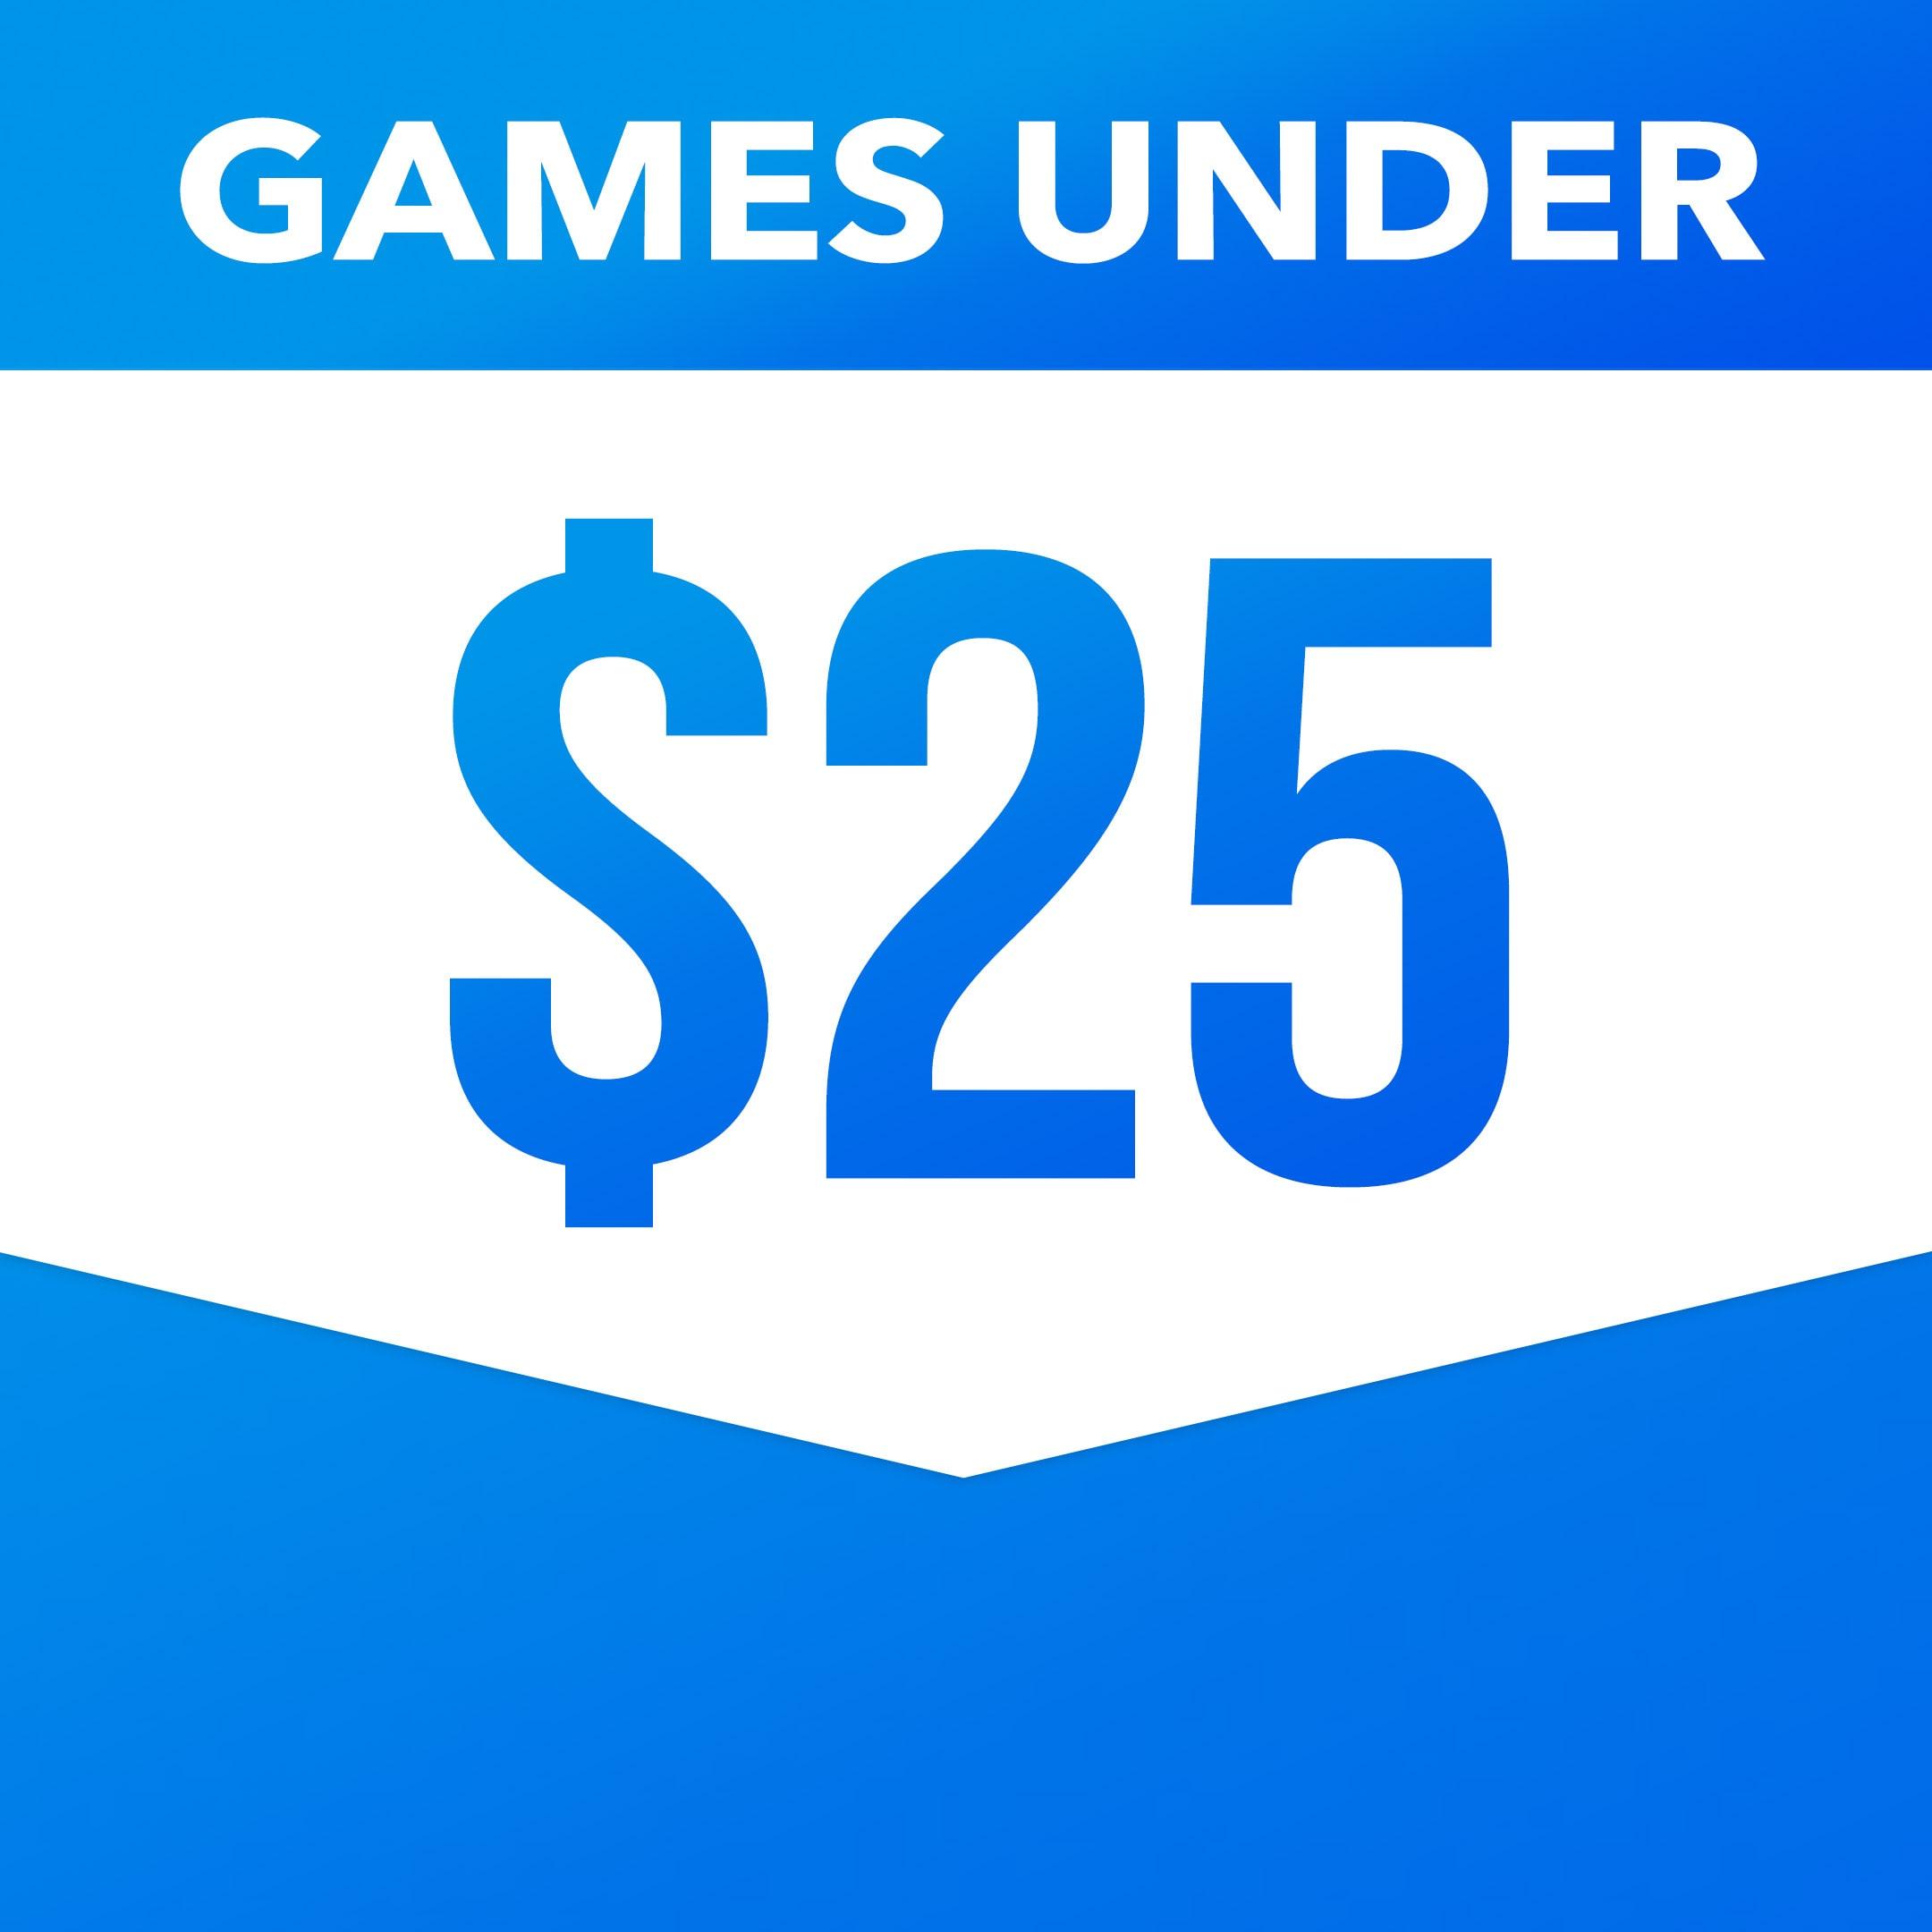 [PROMO] Games Under 20